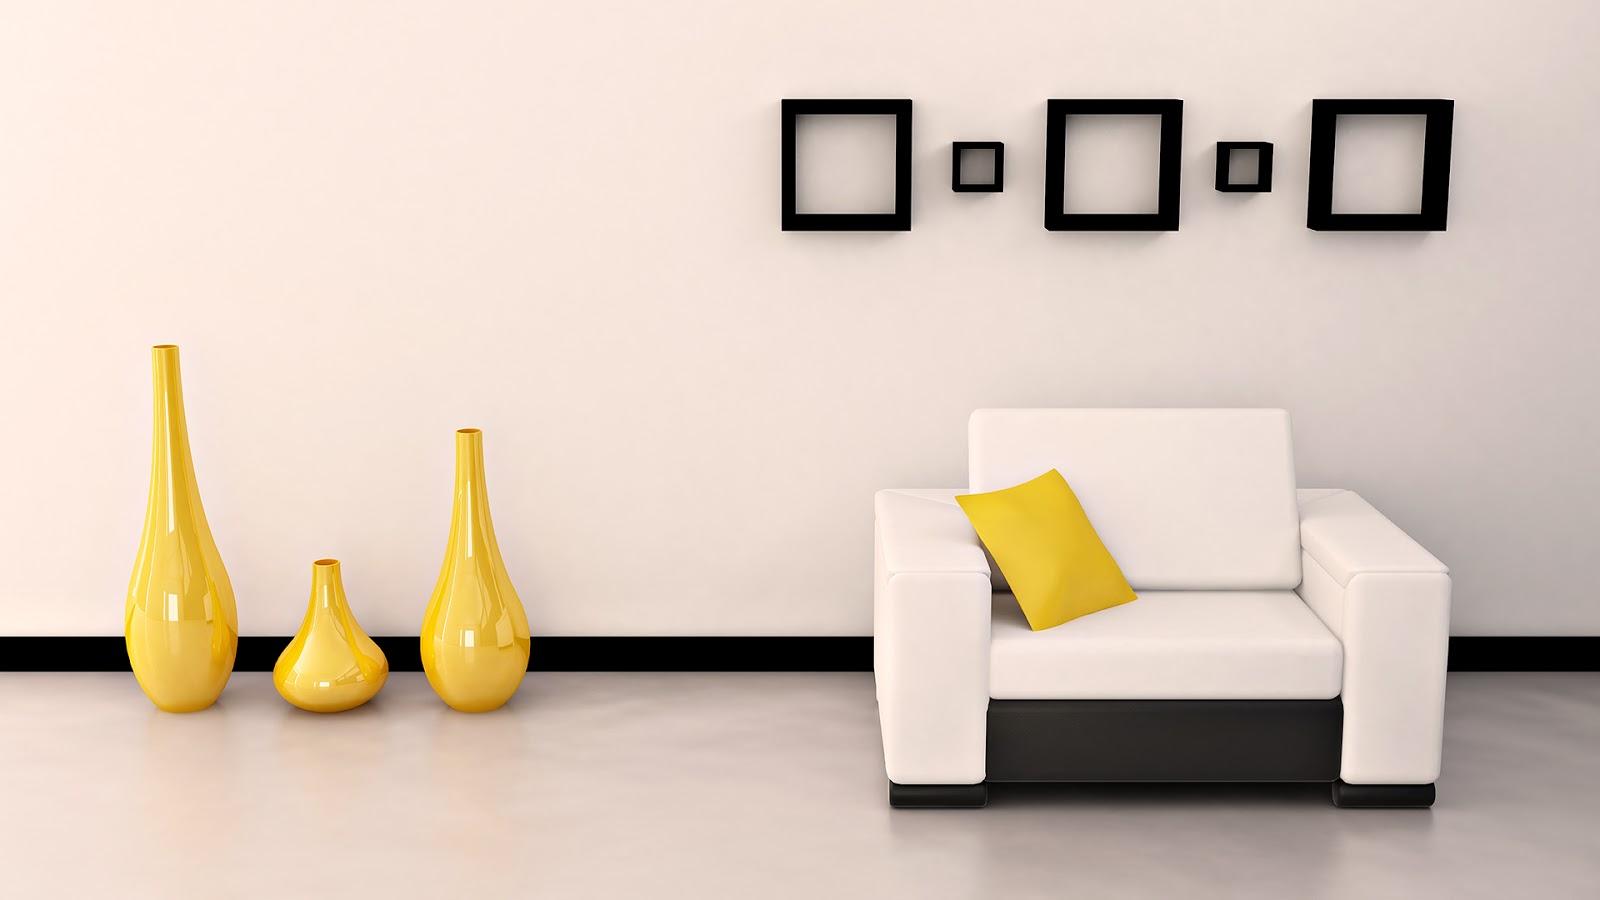 Home hd desktop wallpaper wallpapers free hd desktop - Home Of Wallpaper Home Design Wallpaper 4